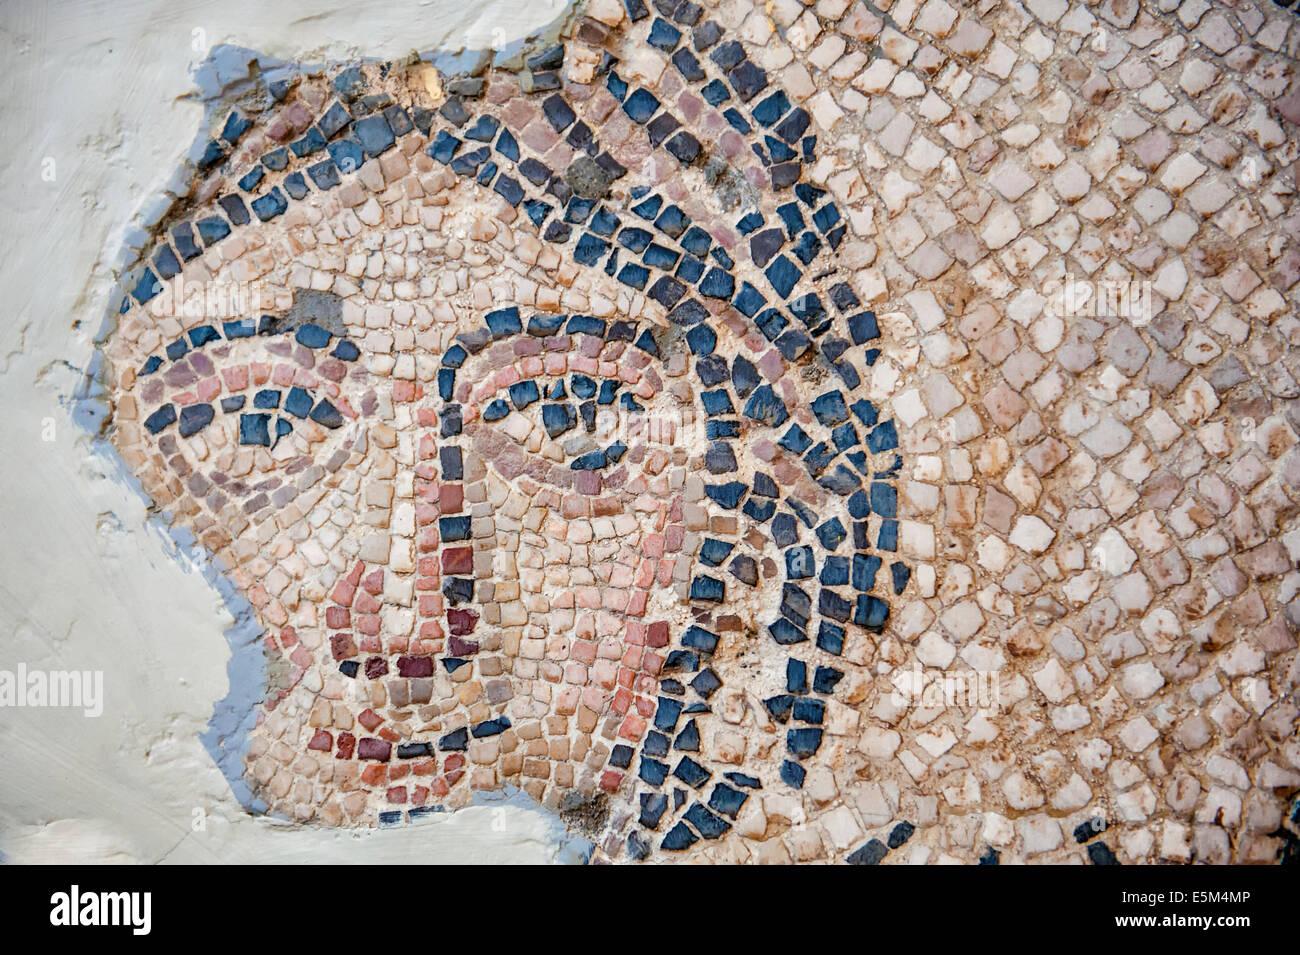 Ananeosis (awakening) mosaic, 5th Cent A.C., Hatay Archaeology Museum, Antioch, Hatay province, Southwest Turkey Stock Photo